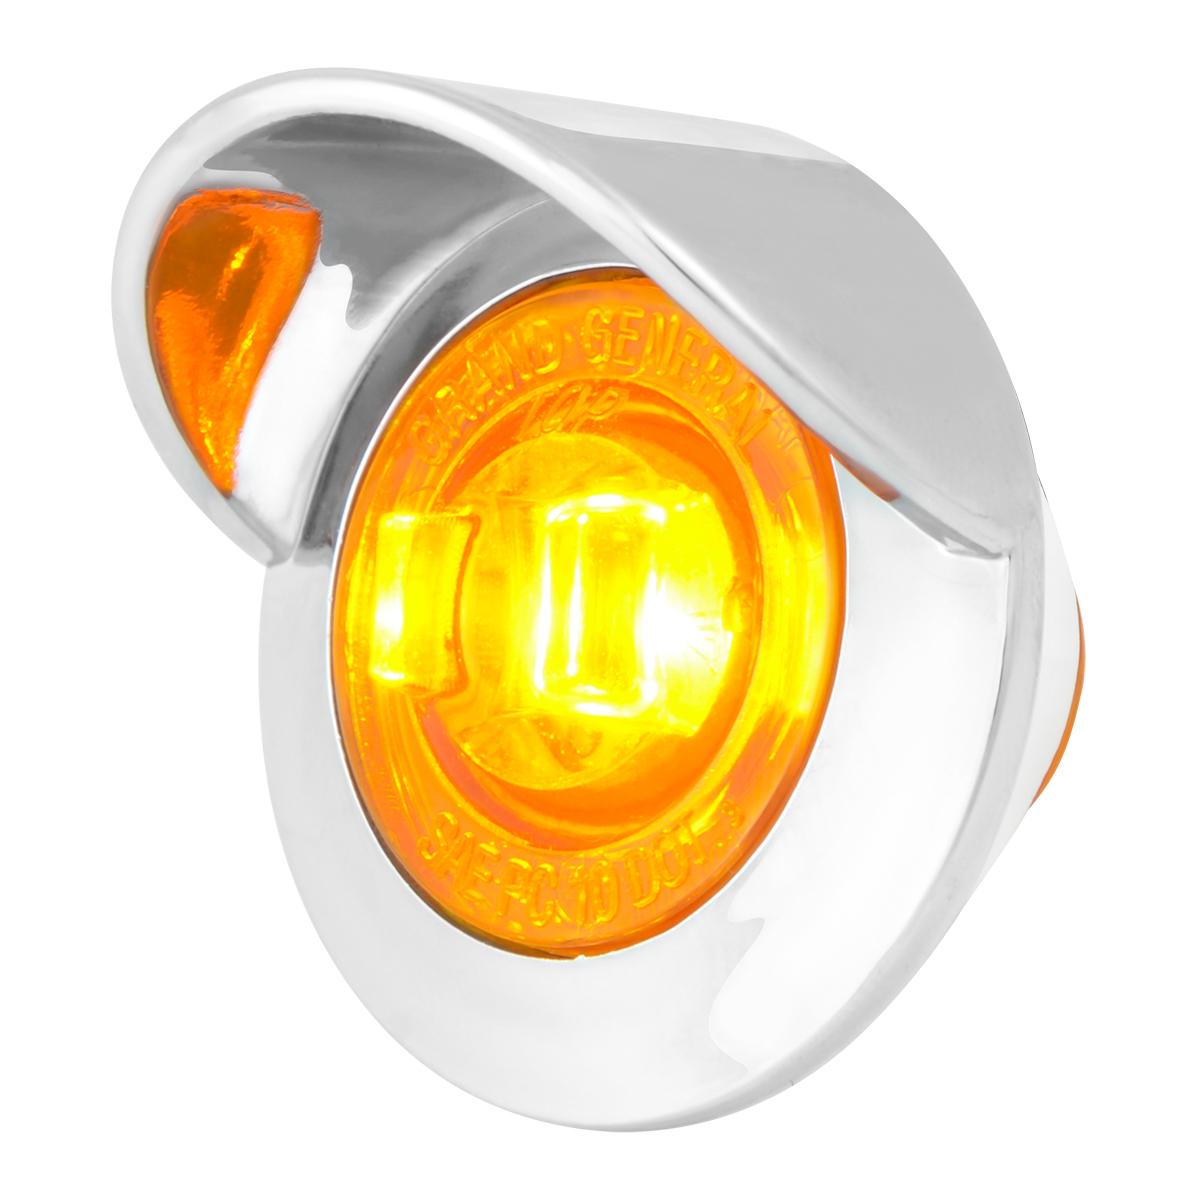 "75260 1"" Dual Function Mini Push/Screw-in Wide Angle LED Light w/ Chrome Bezel & Visor"